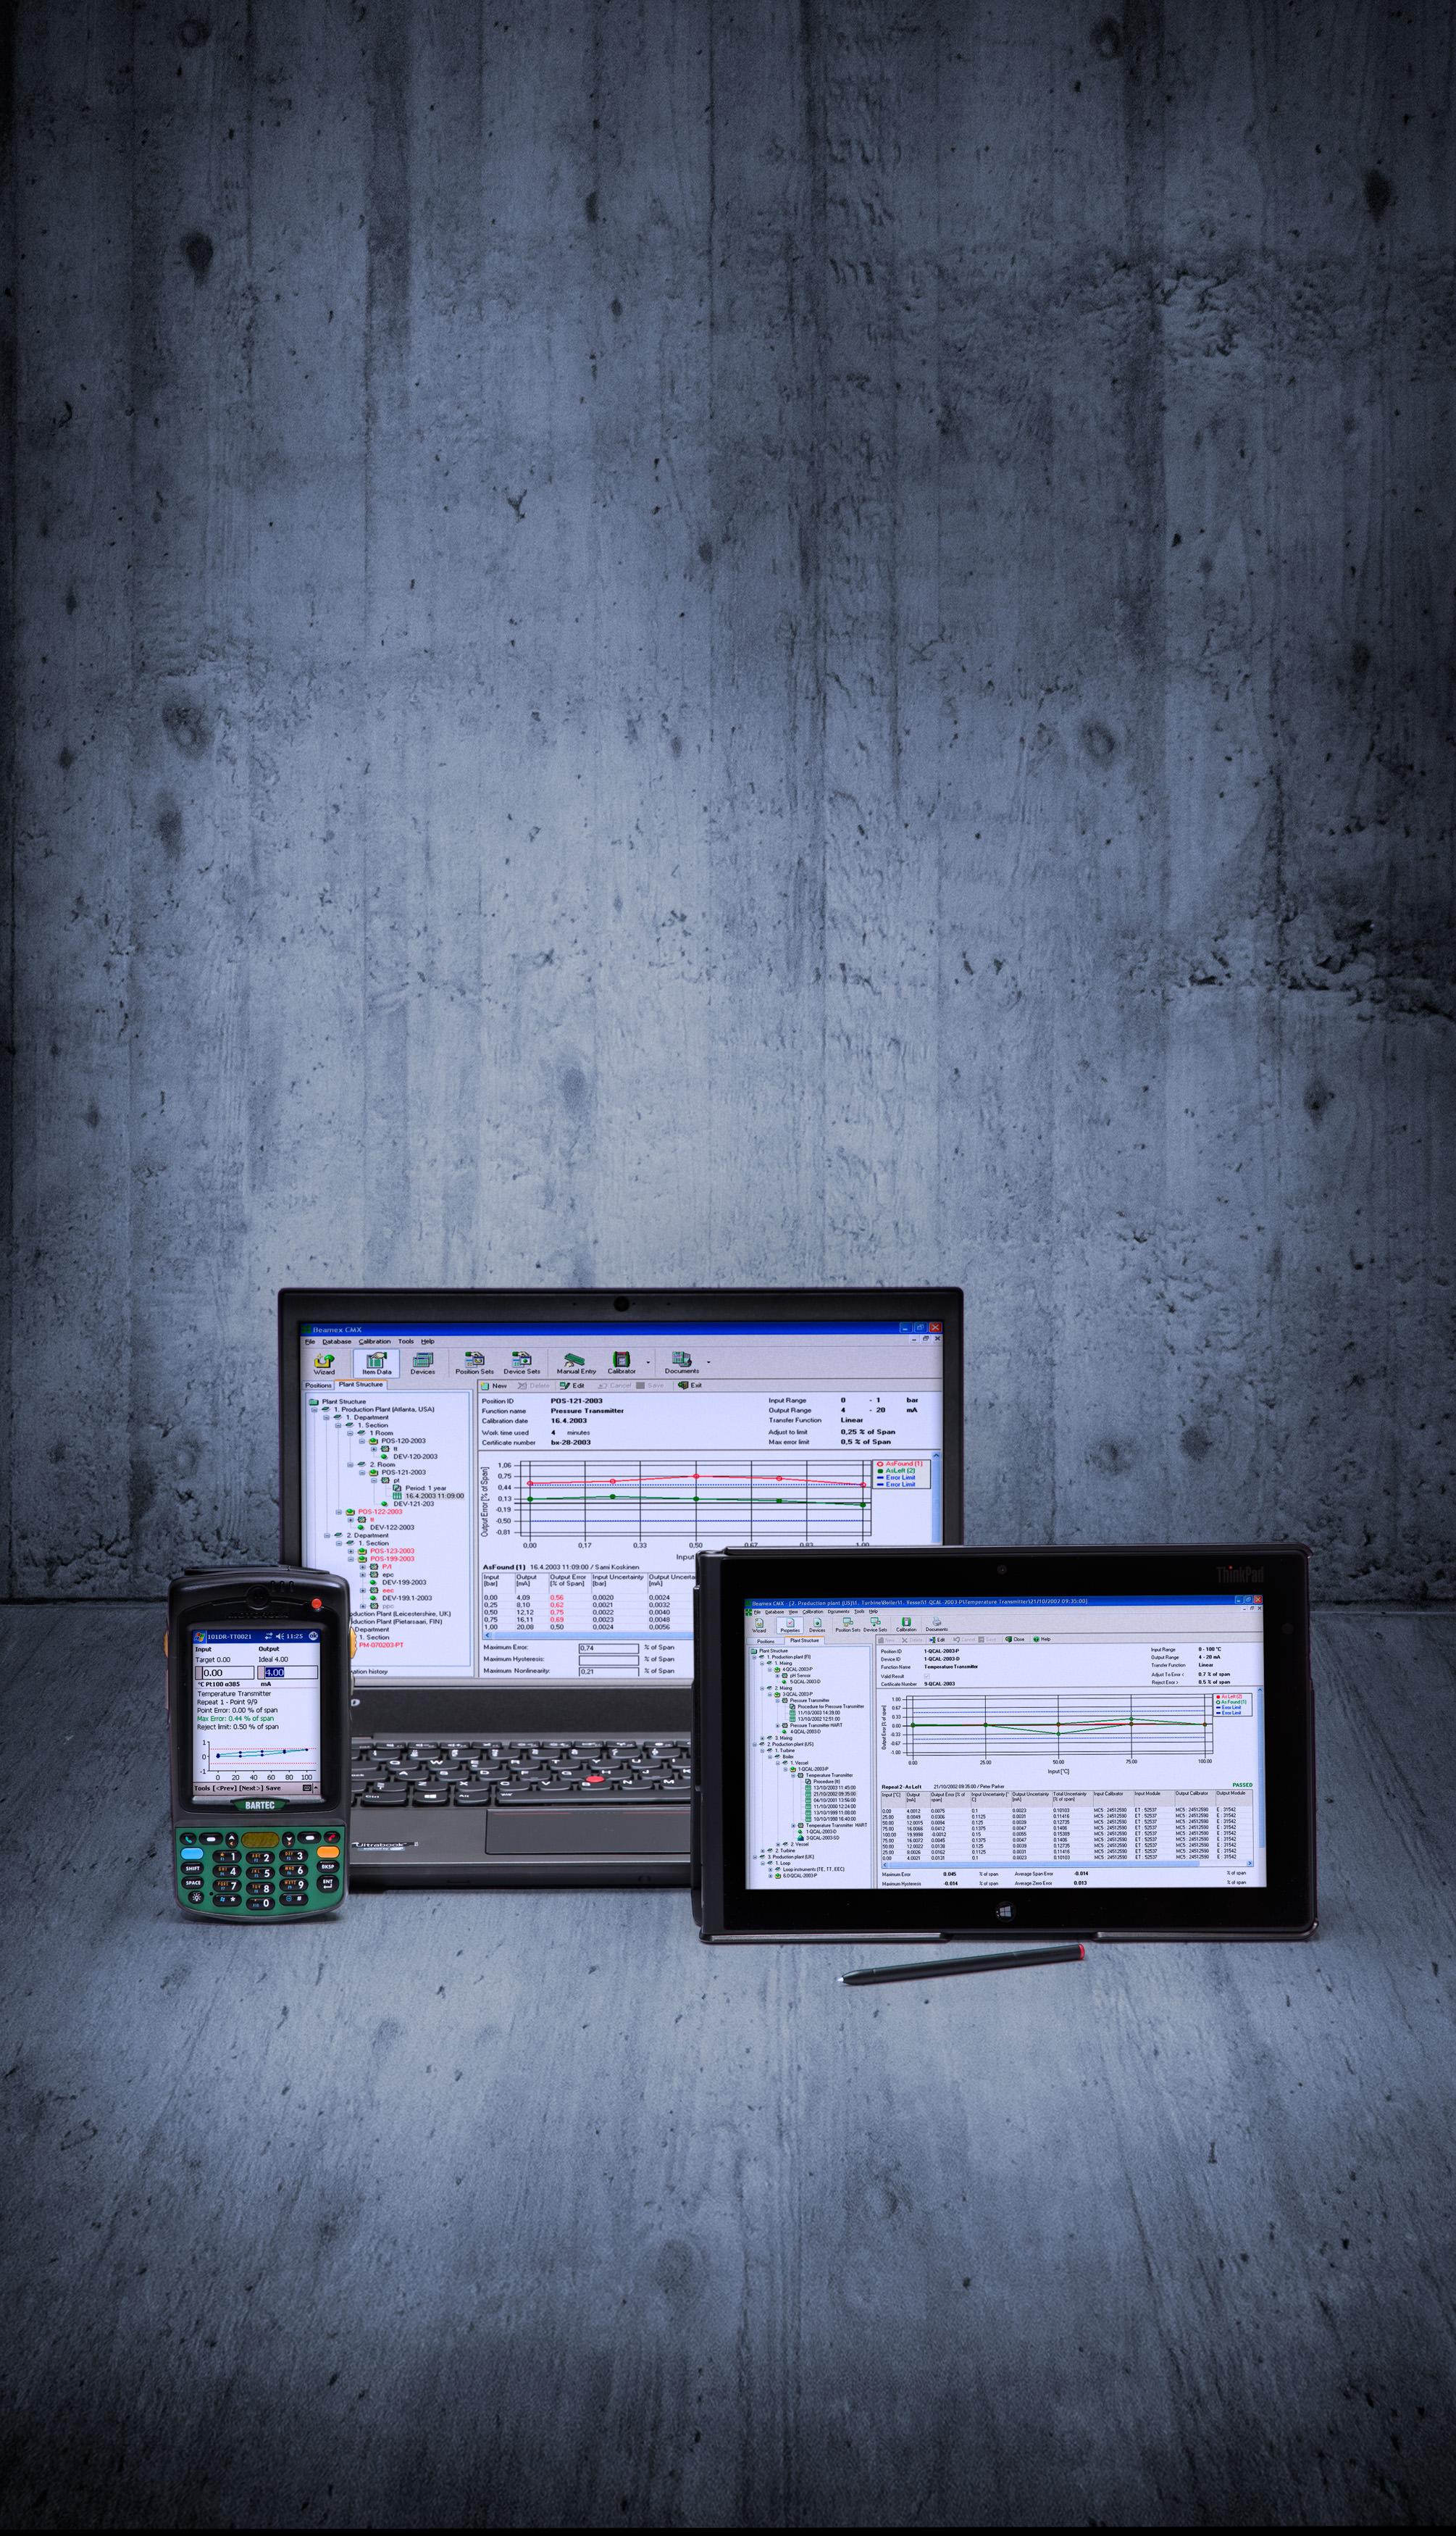 Beamex CMX calibration software